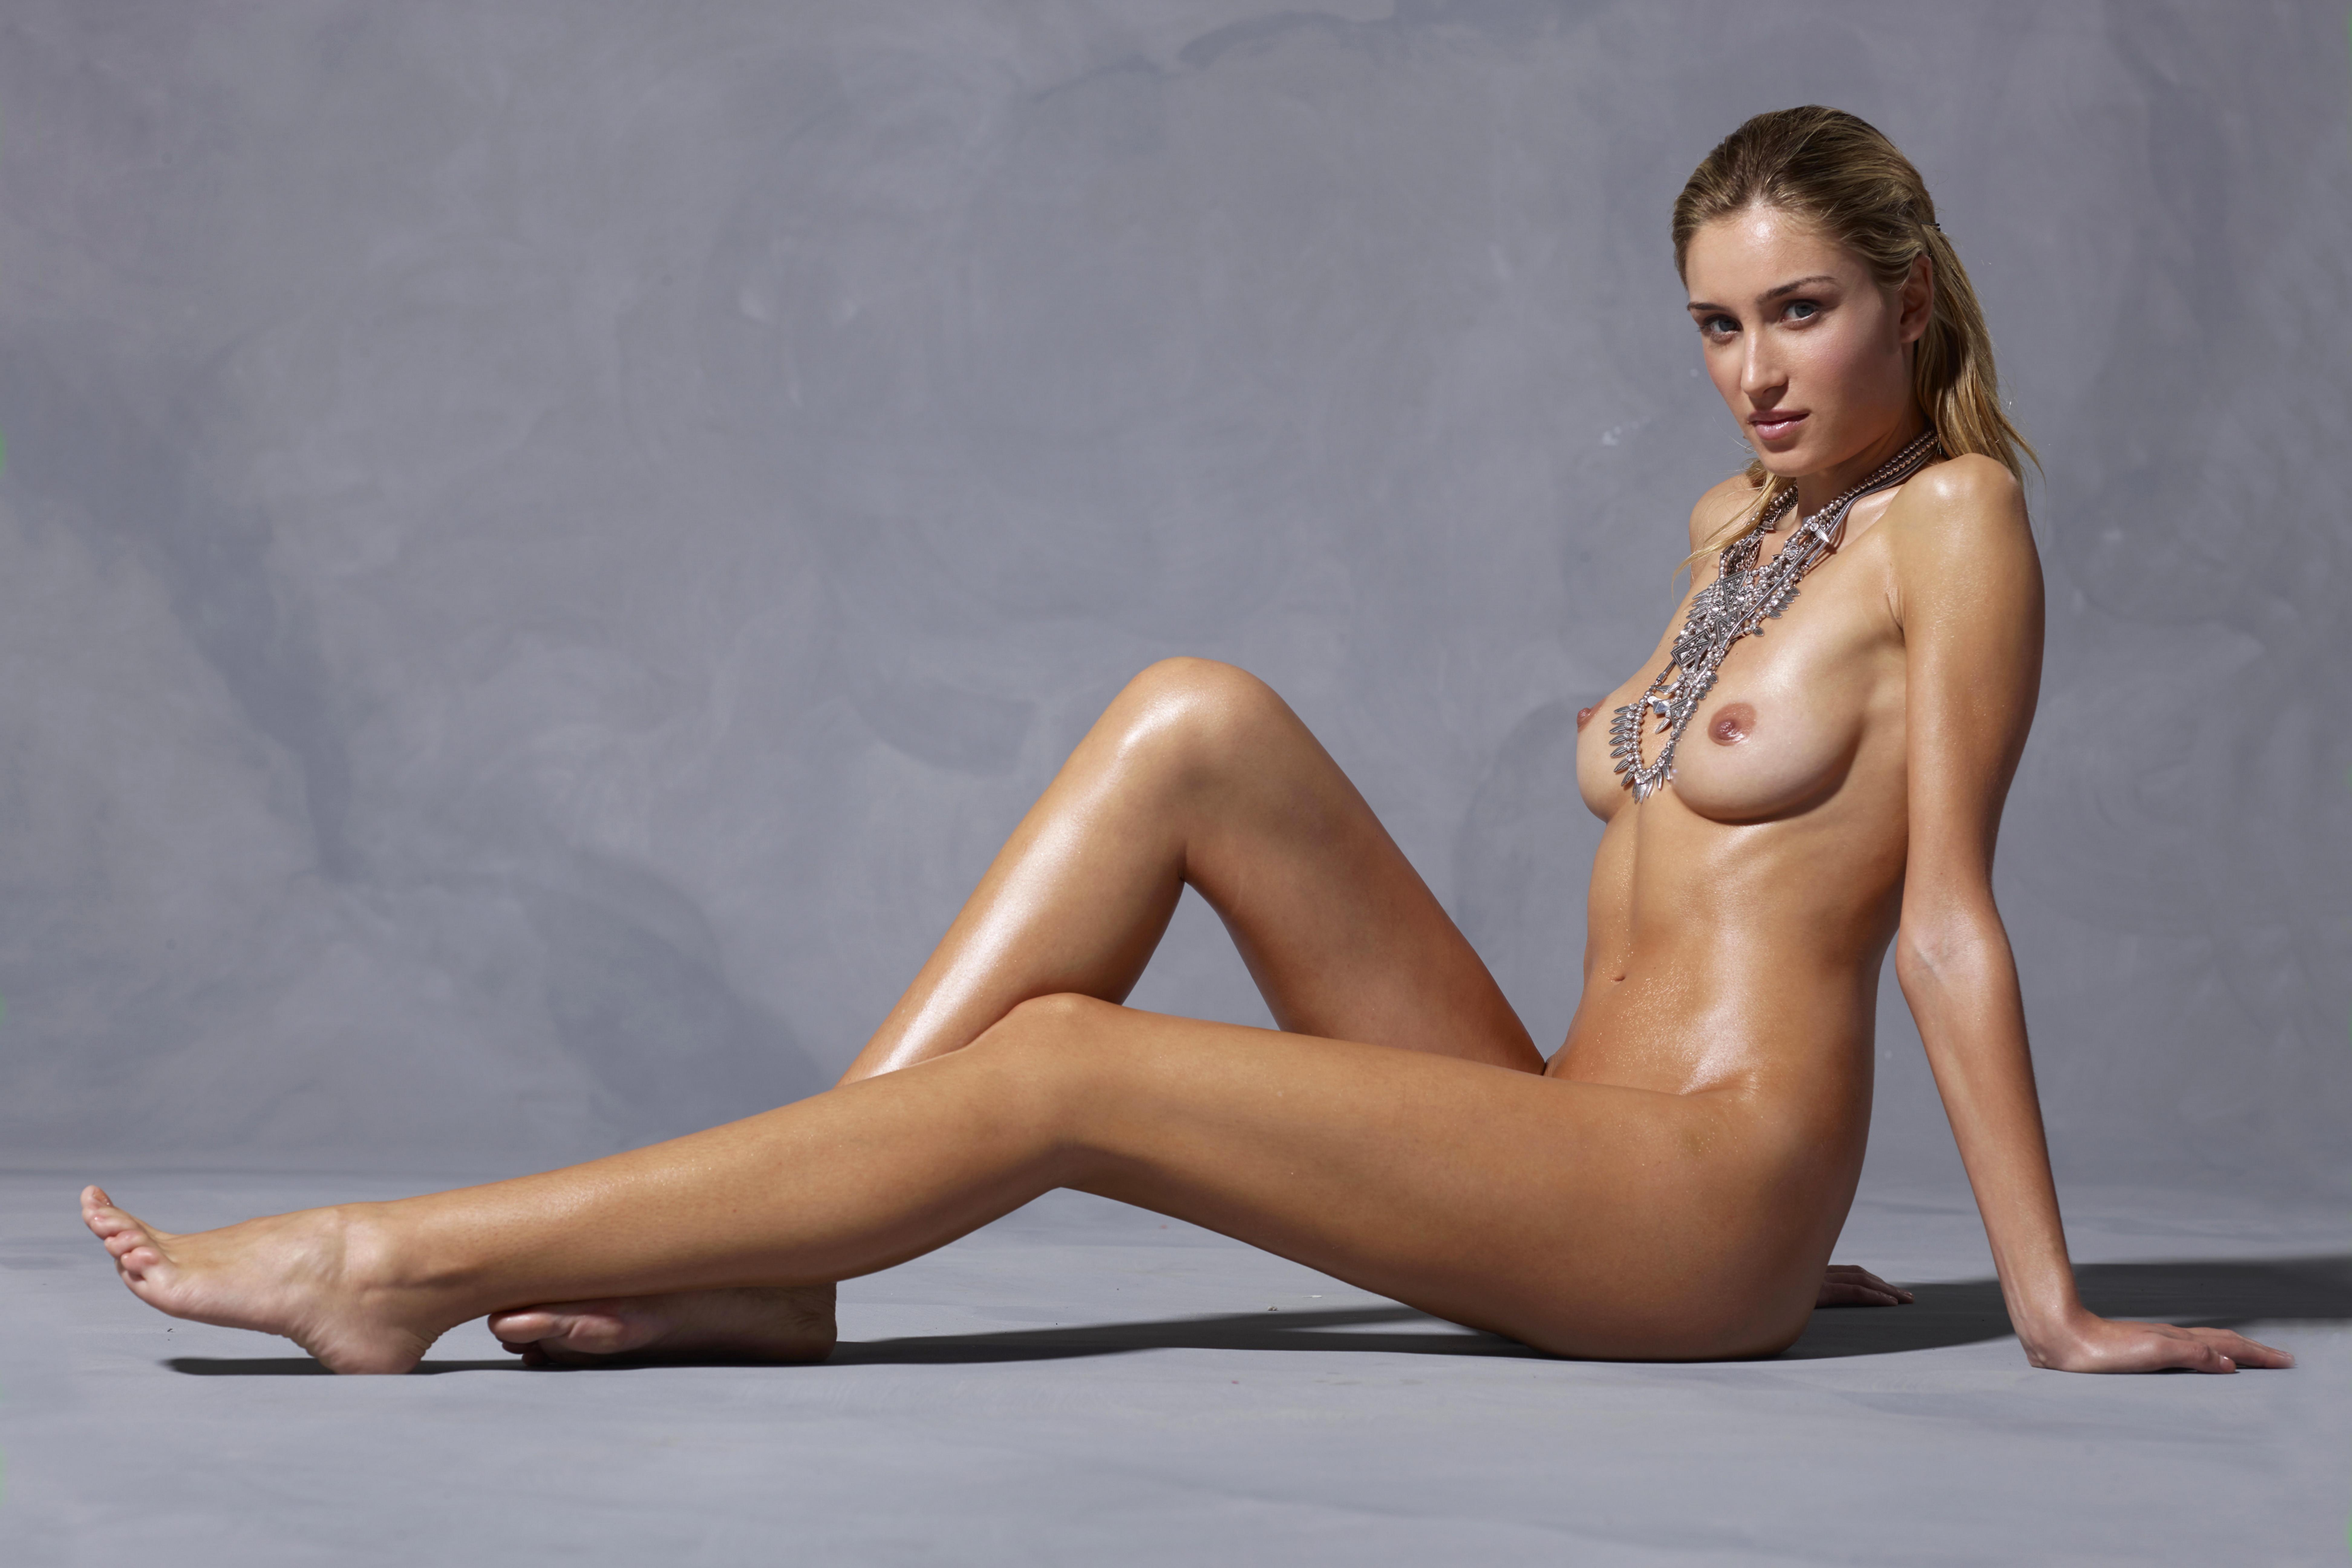 Models nude pic, slavegirl spank comix